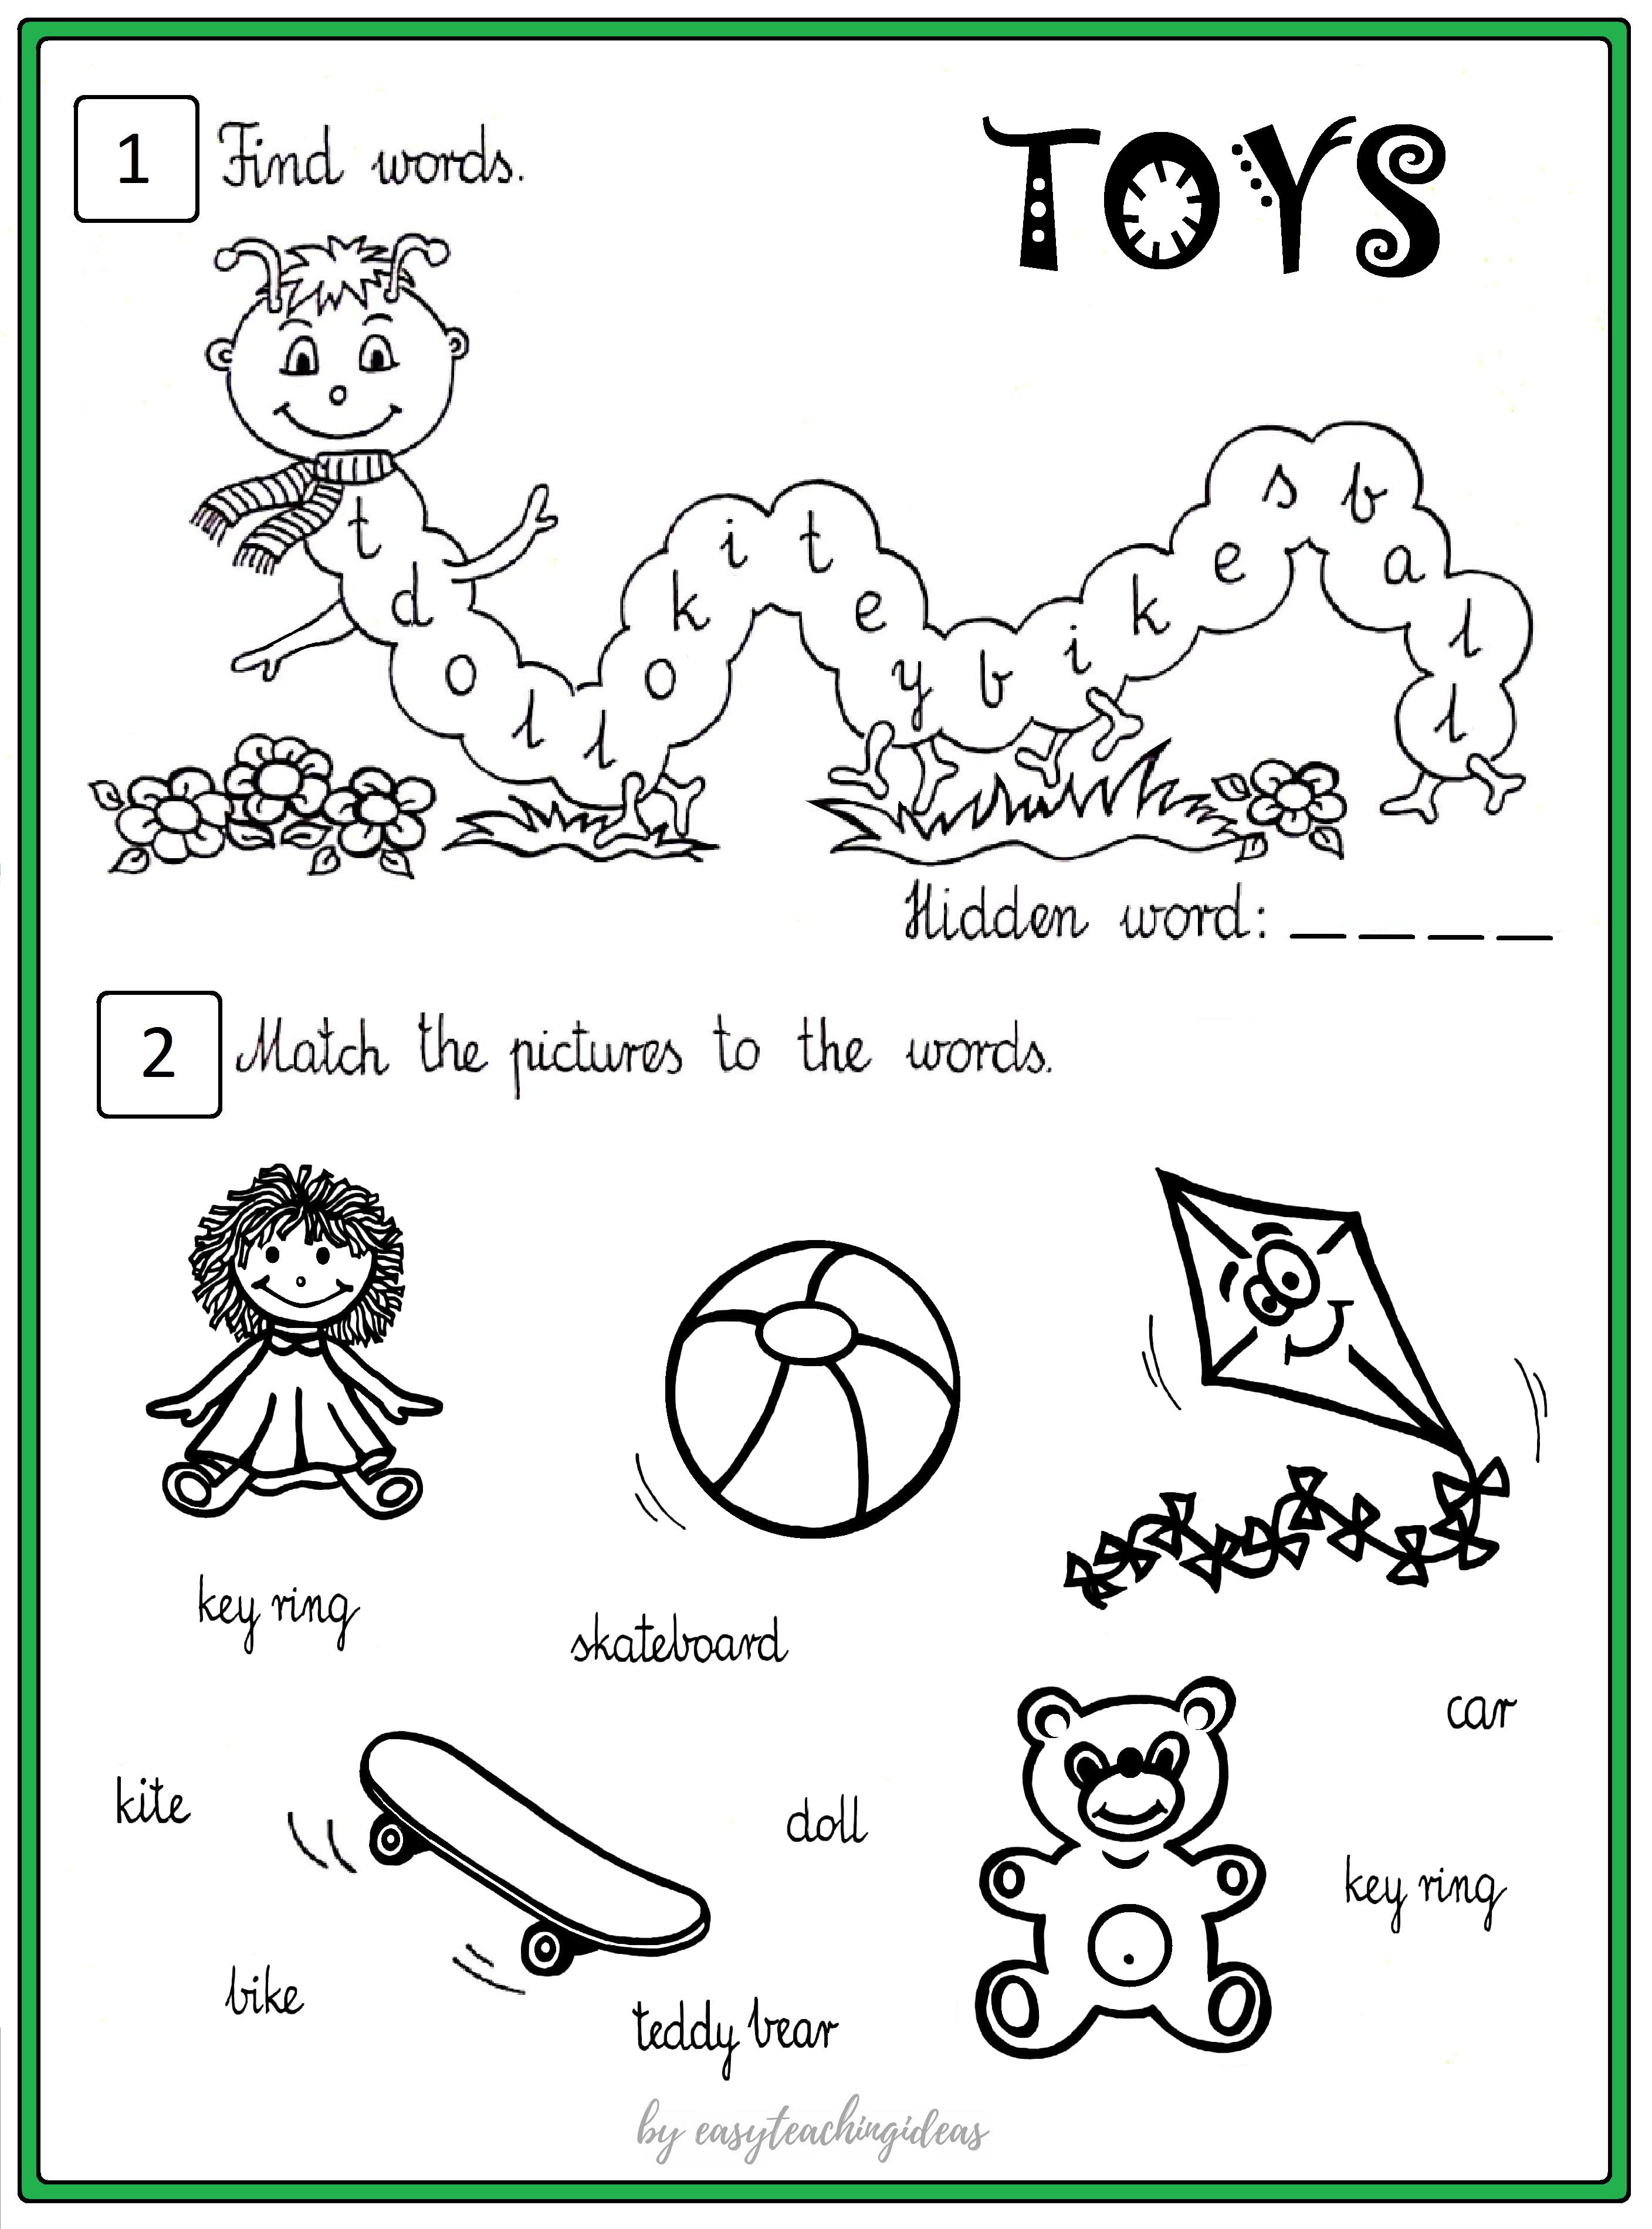 Pin Od Veni Vidi Vici Na Crosswords Wordsnakes Wordsearches Worksheets